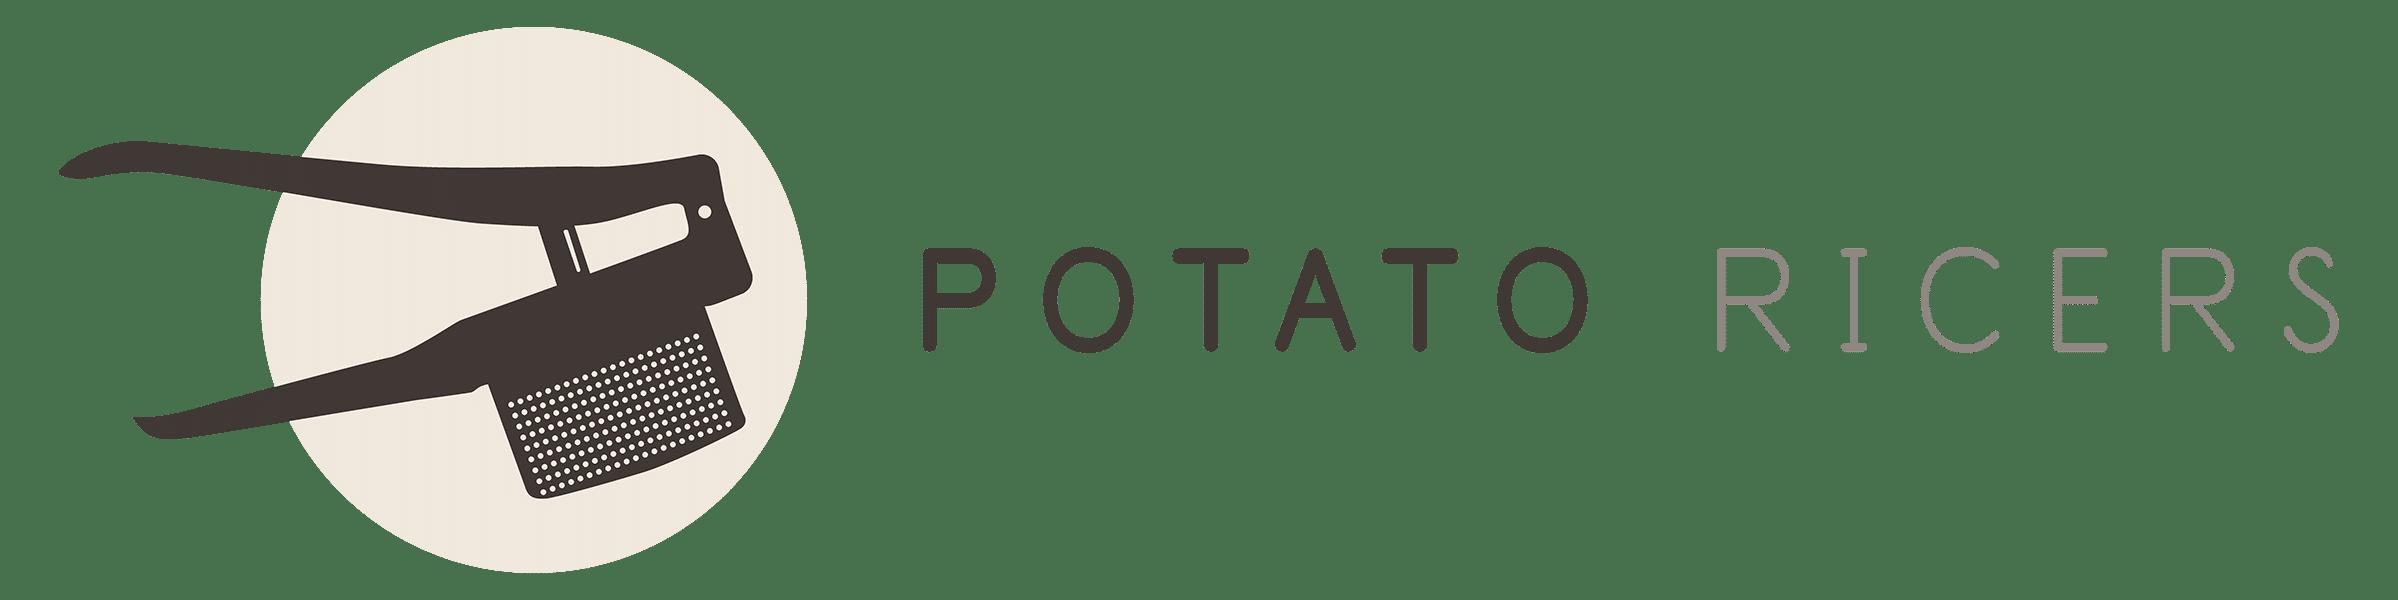 PotatoRicers.com